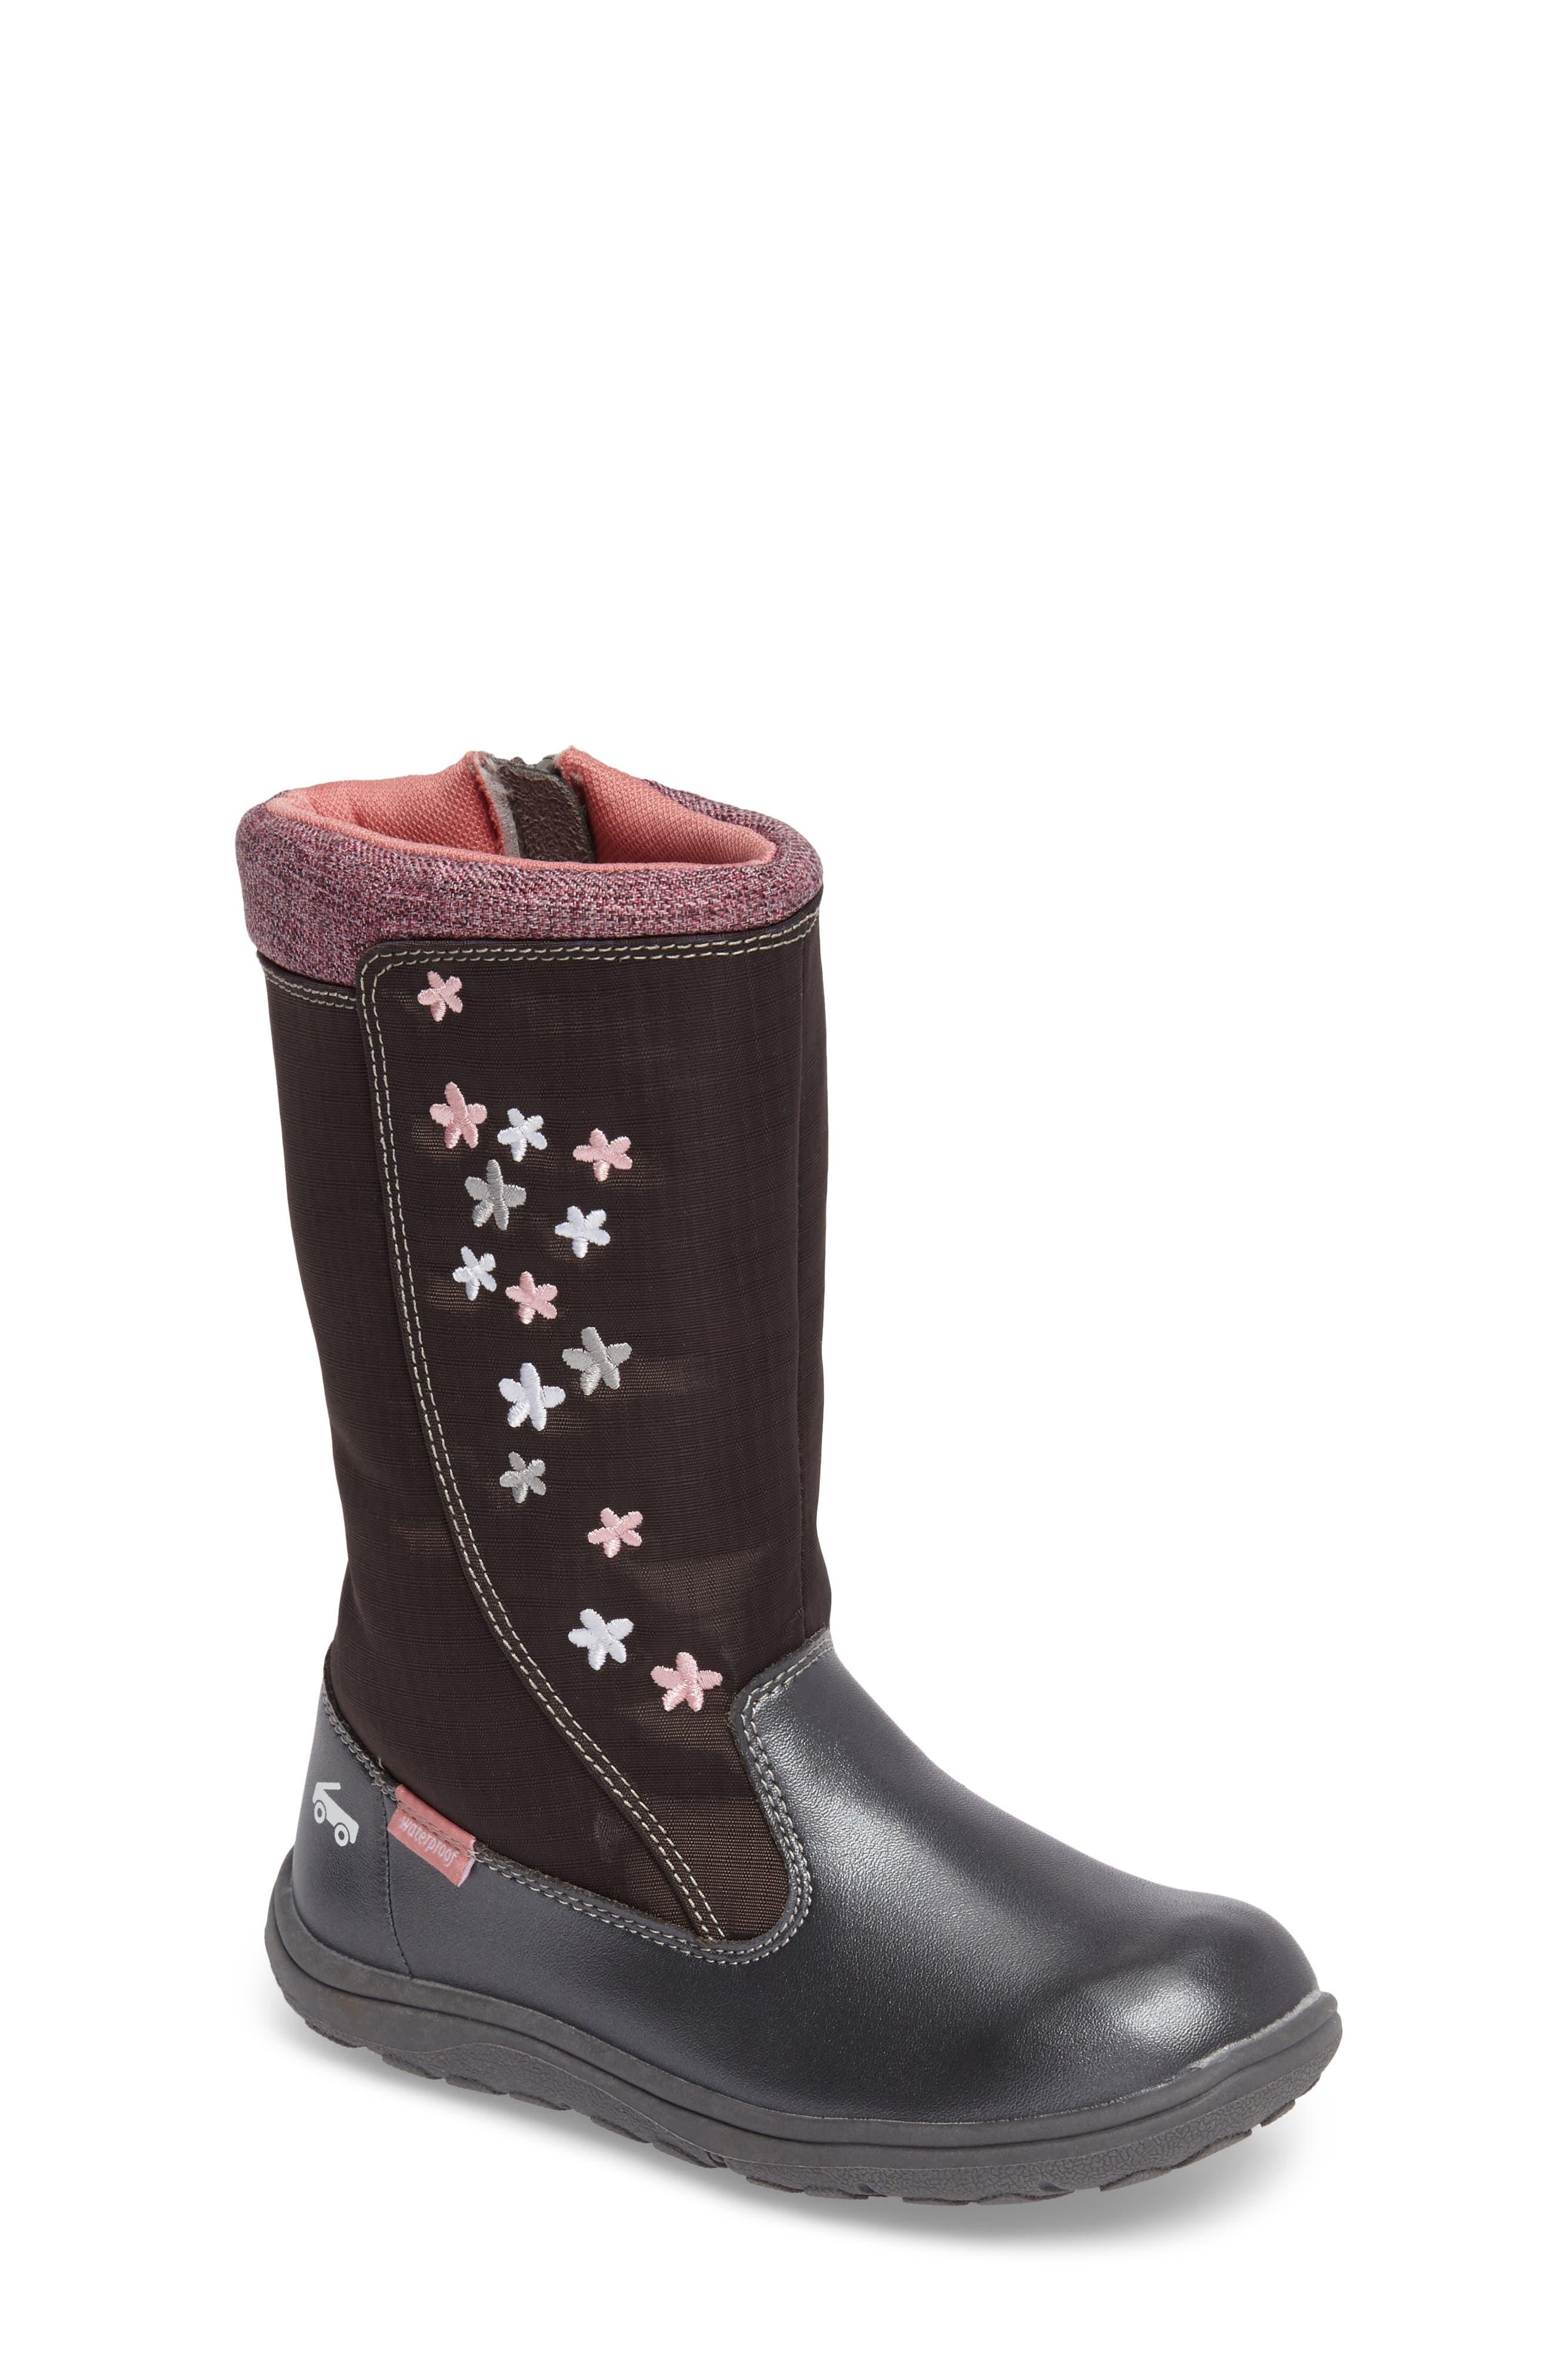 'Hallie' Waterproof Boot,                             Main thumbnail 1, color,                             021